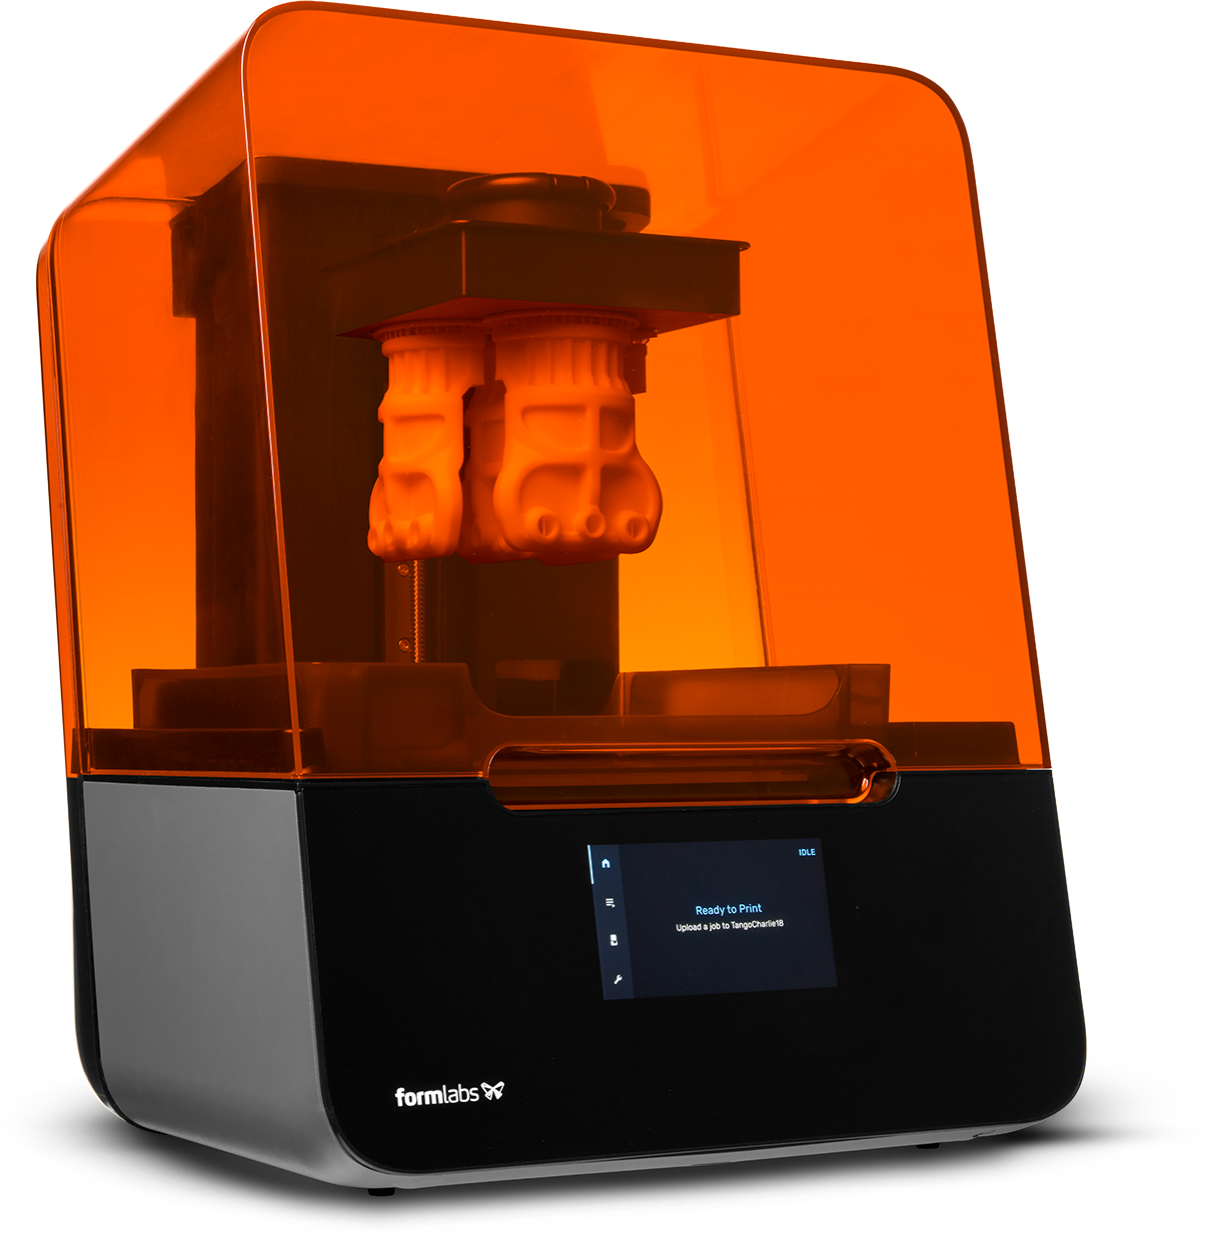 formlabs form 3 desktop sla printer 3d sla printers 3d printing resin 3d printers 3d printers 3D printing 3d printer resin 3d printer digital light processing dlp 3d printing